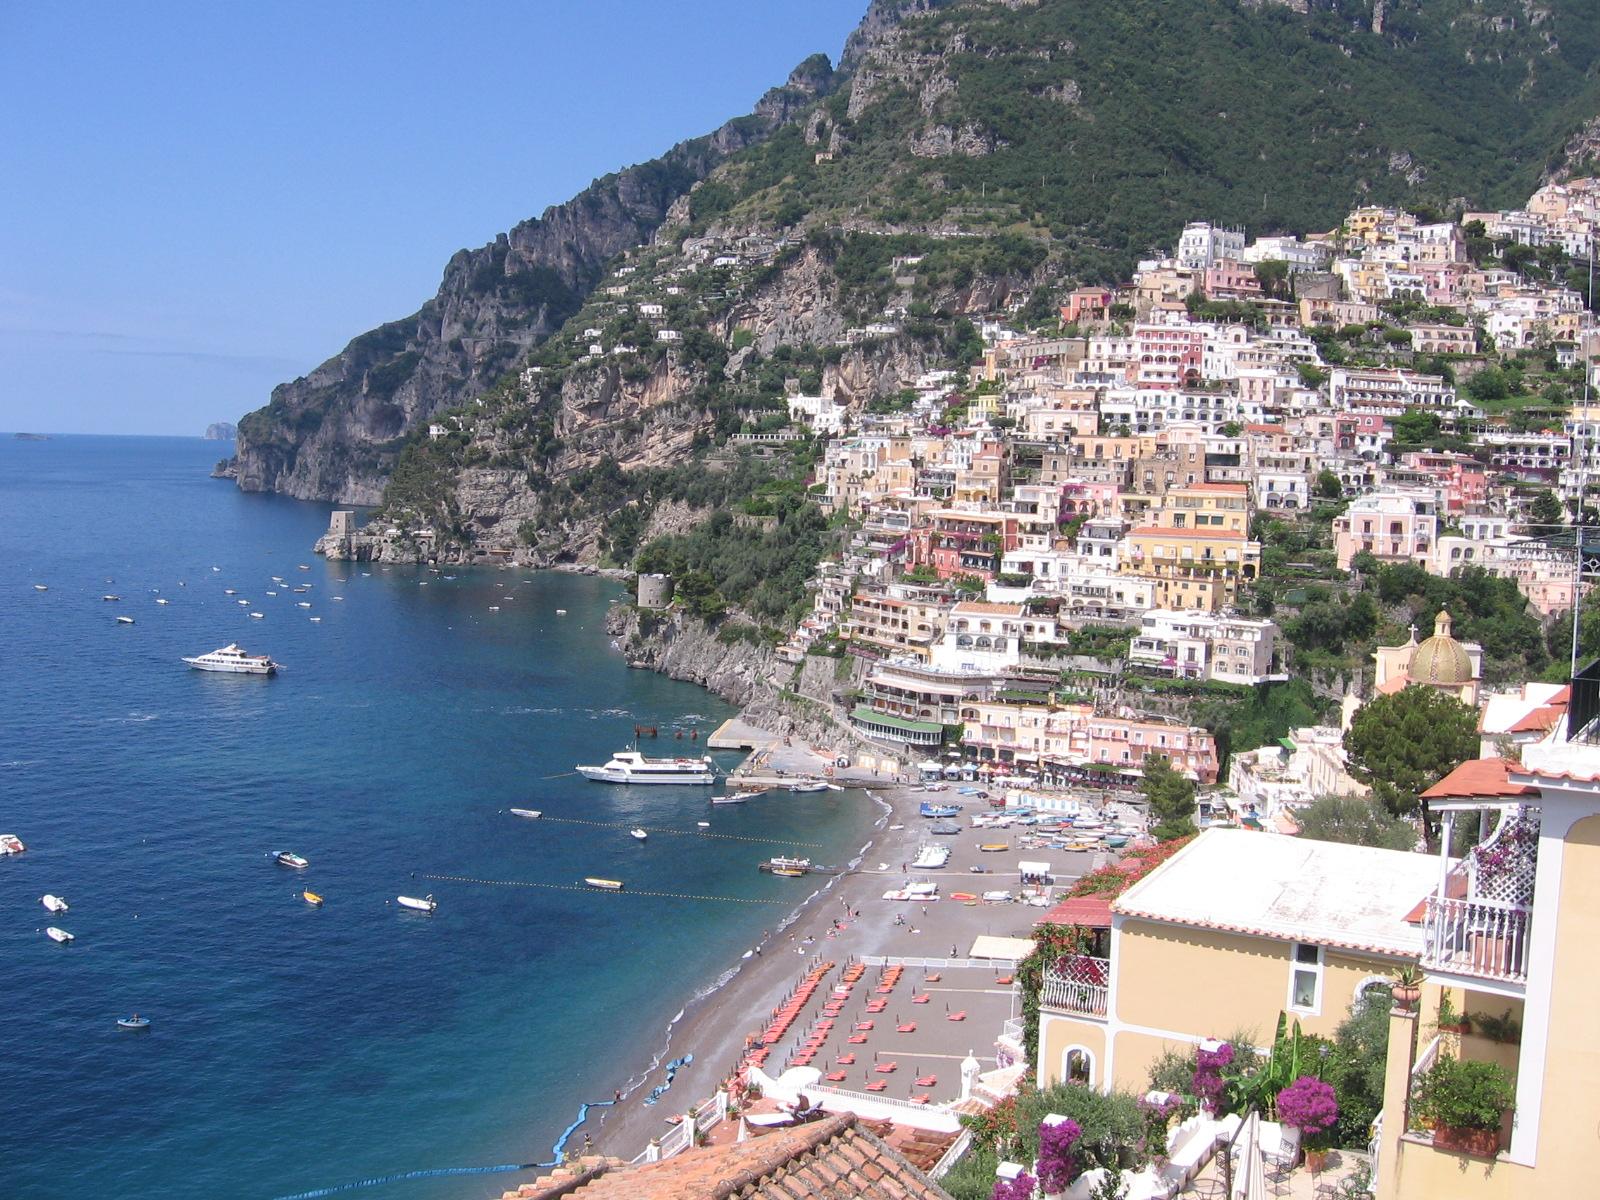 ITALY - Almafi IMG_3305.JPG